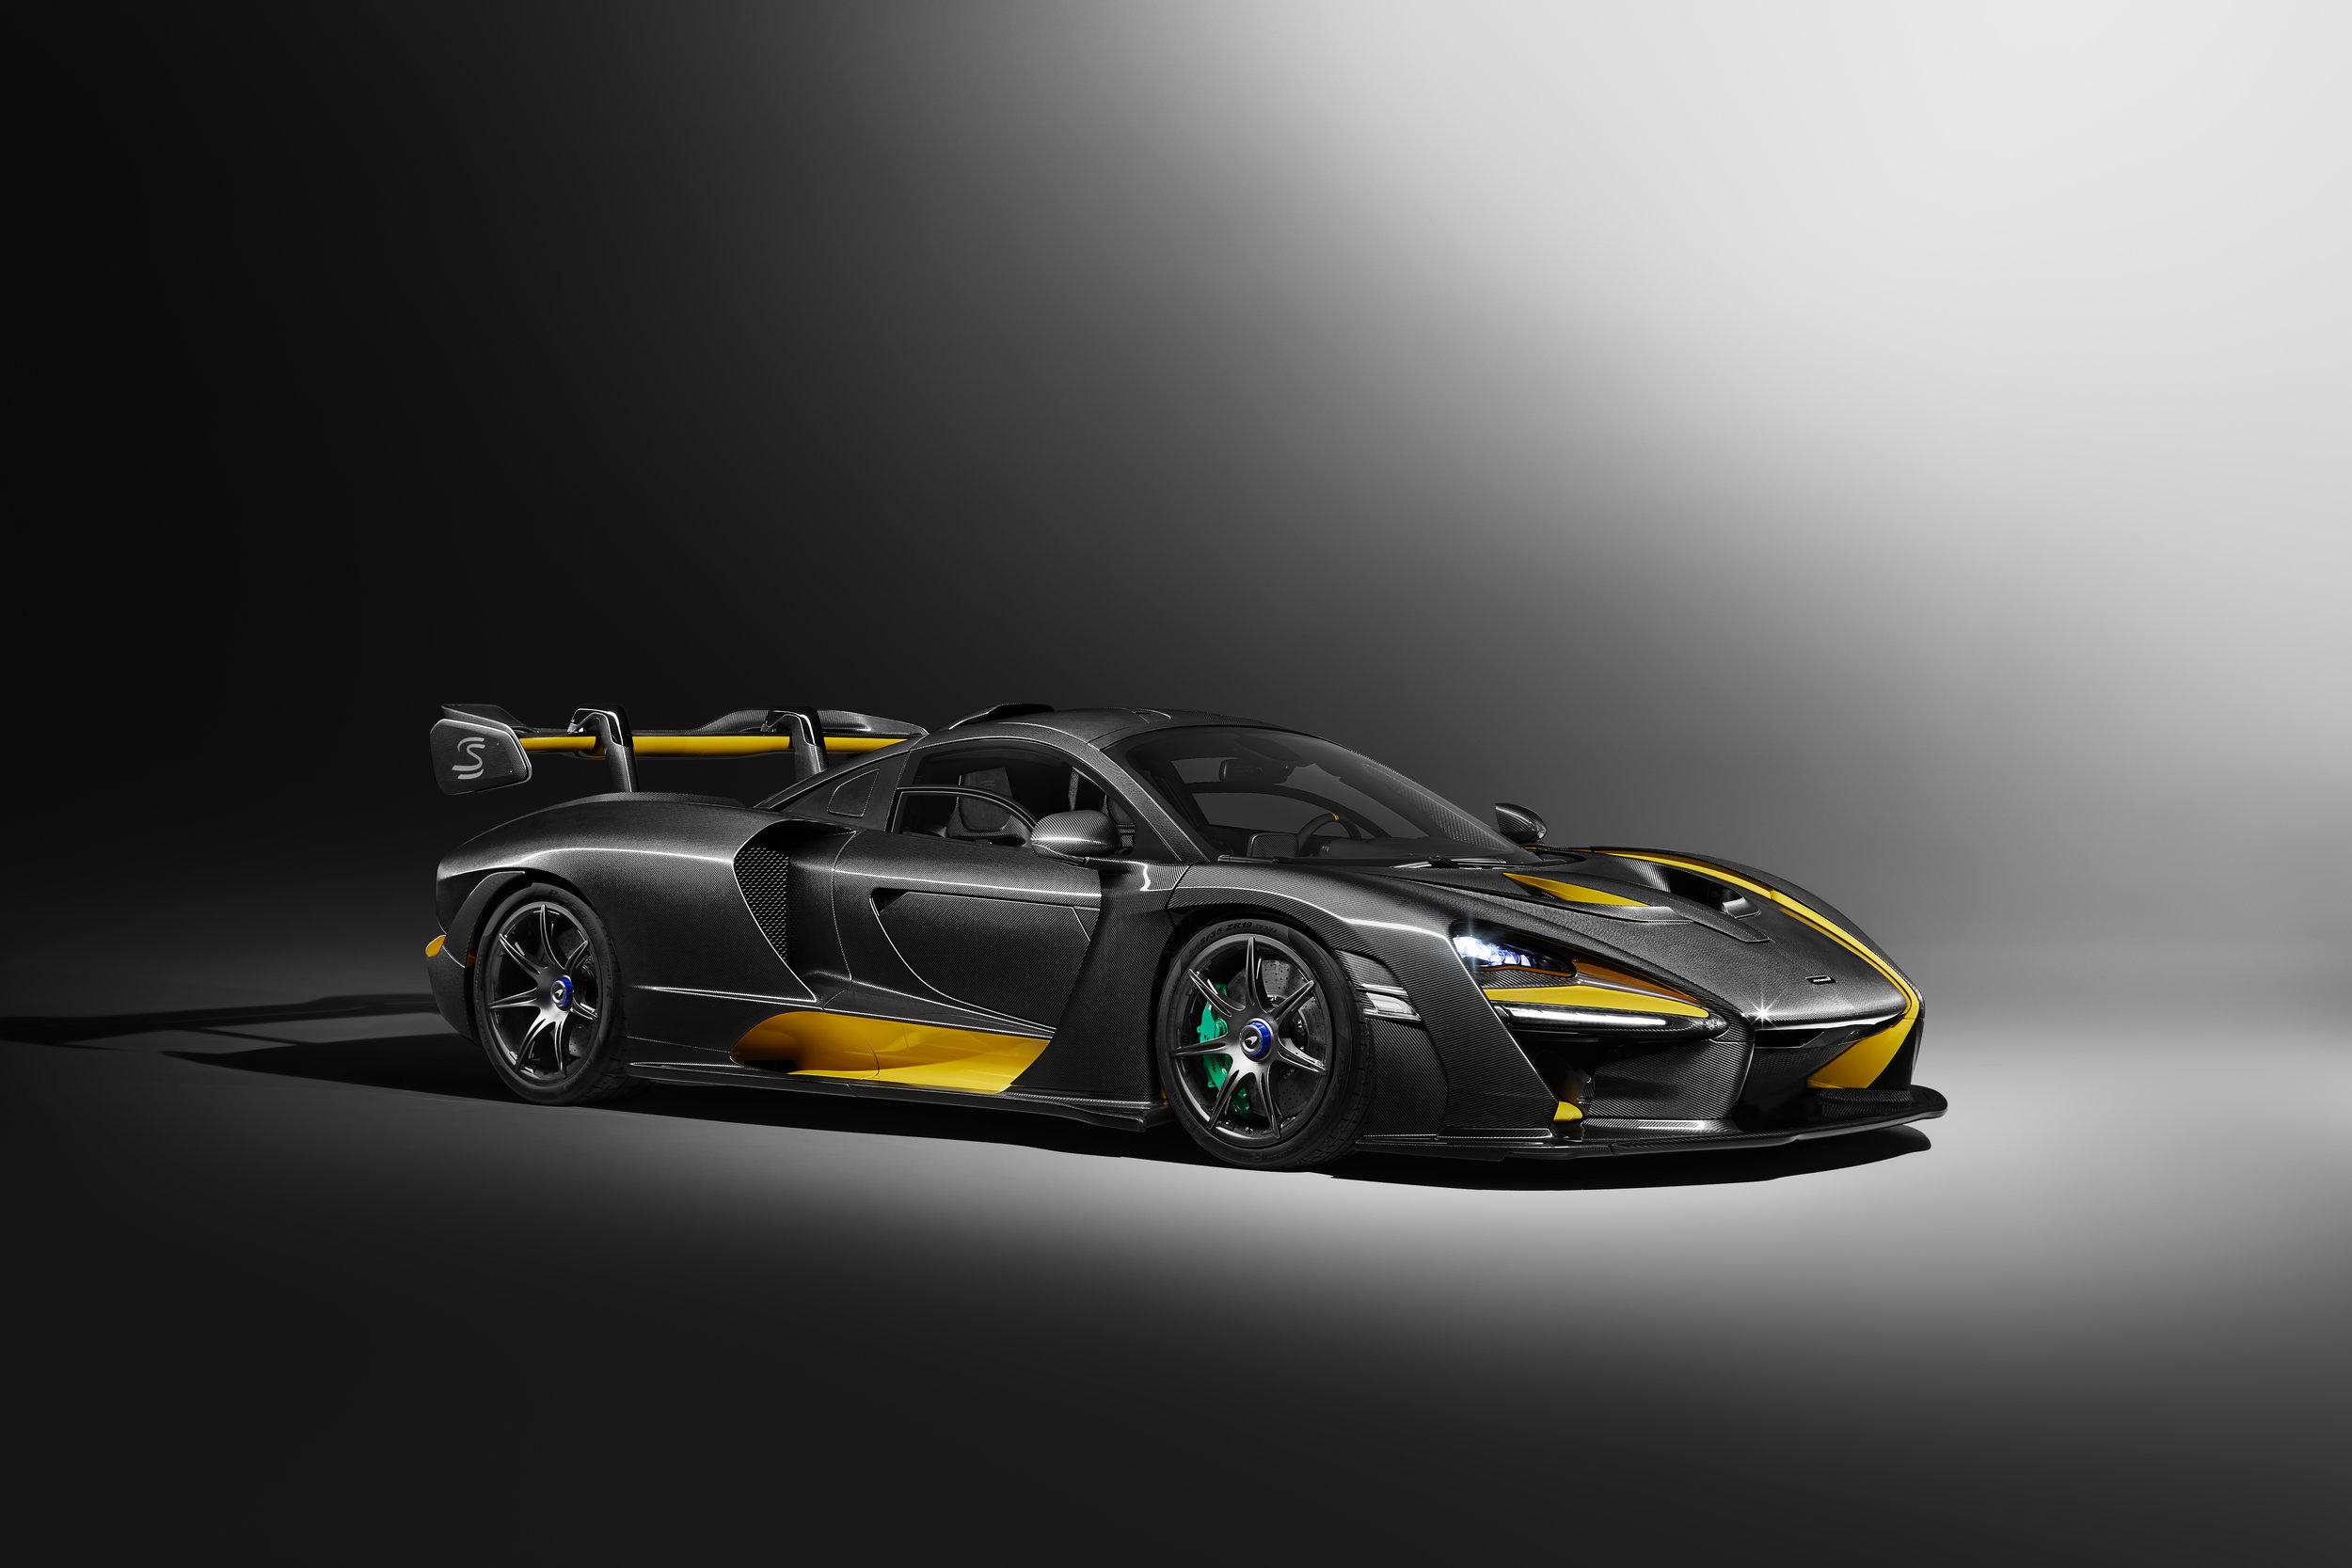 8951McLaren-Senna-Carbon-Theme-by-MSO_01.jpg